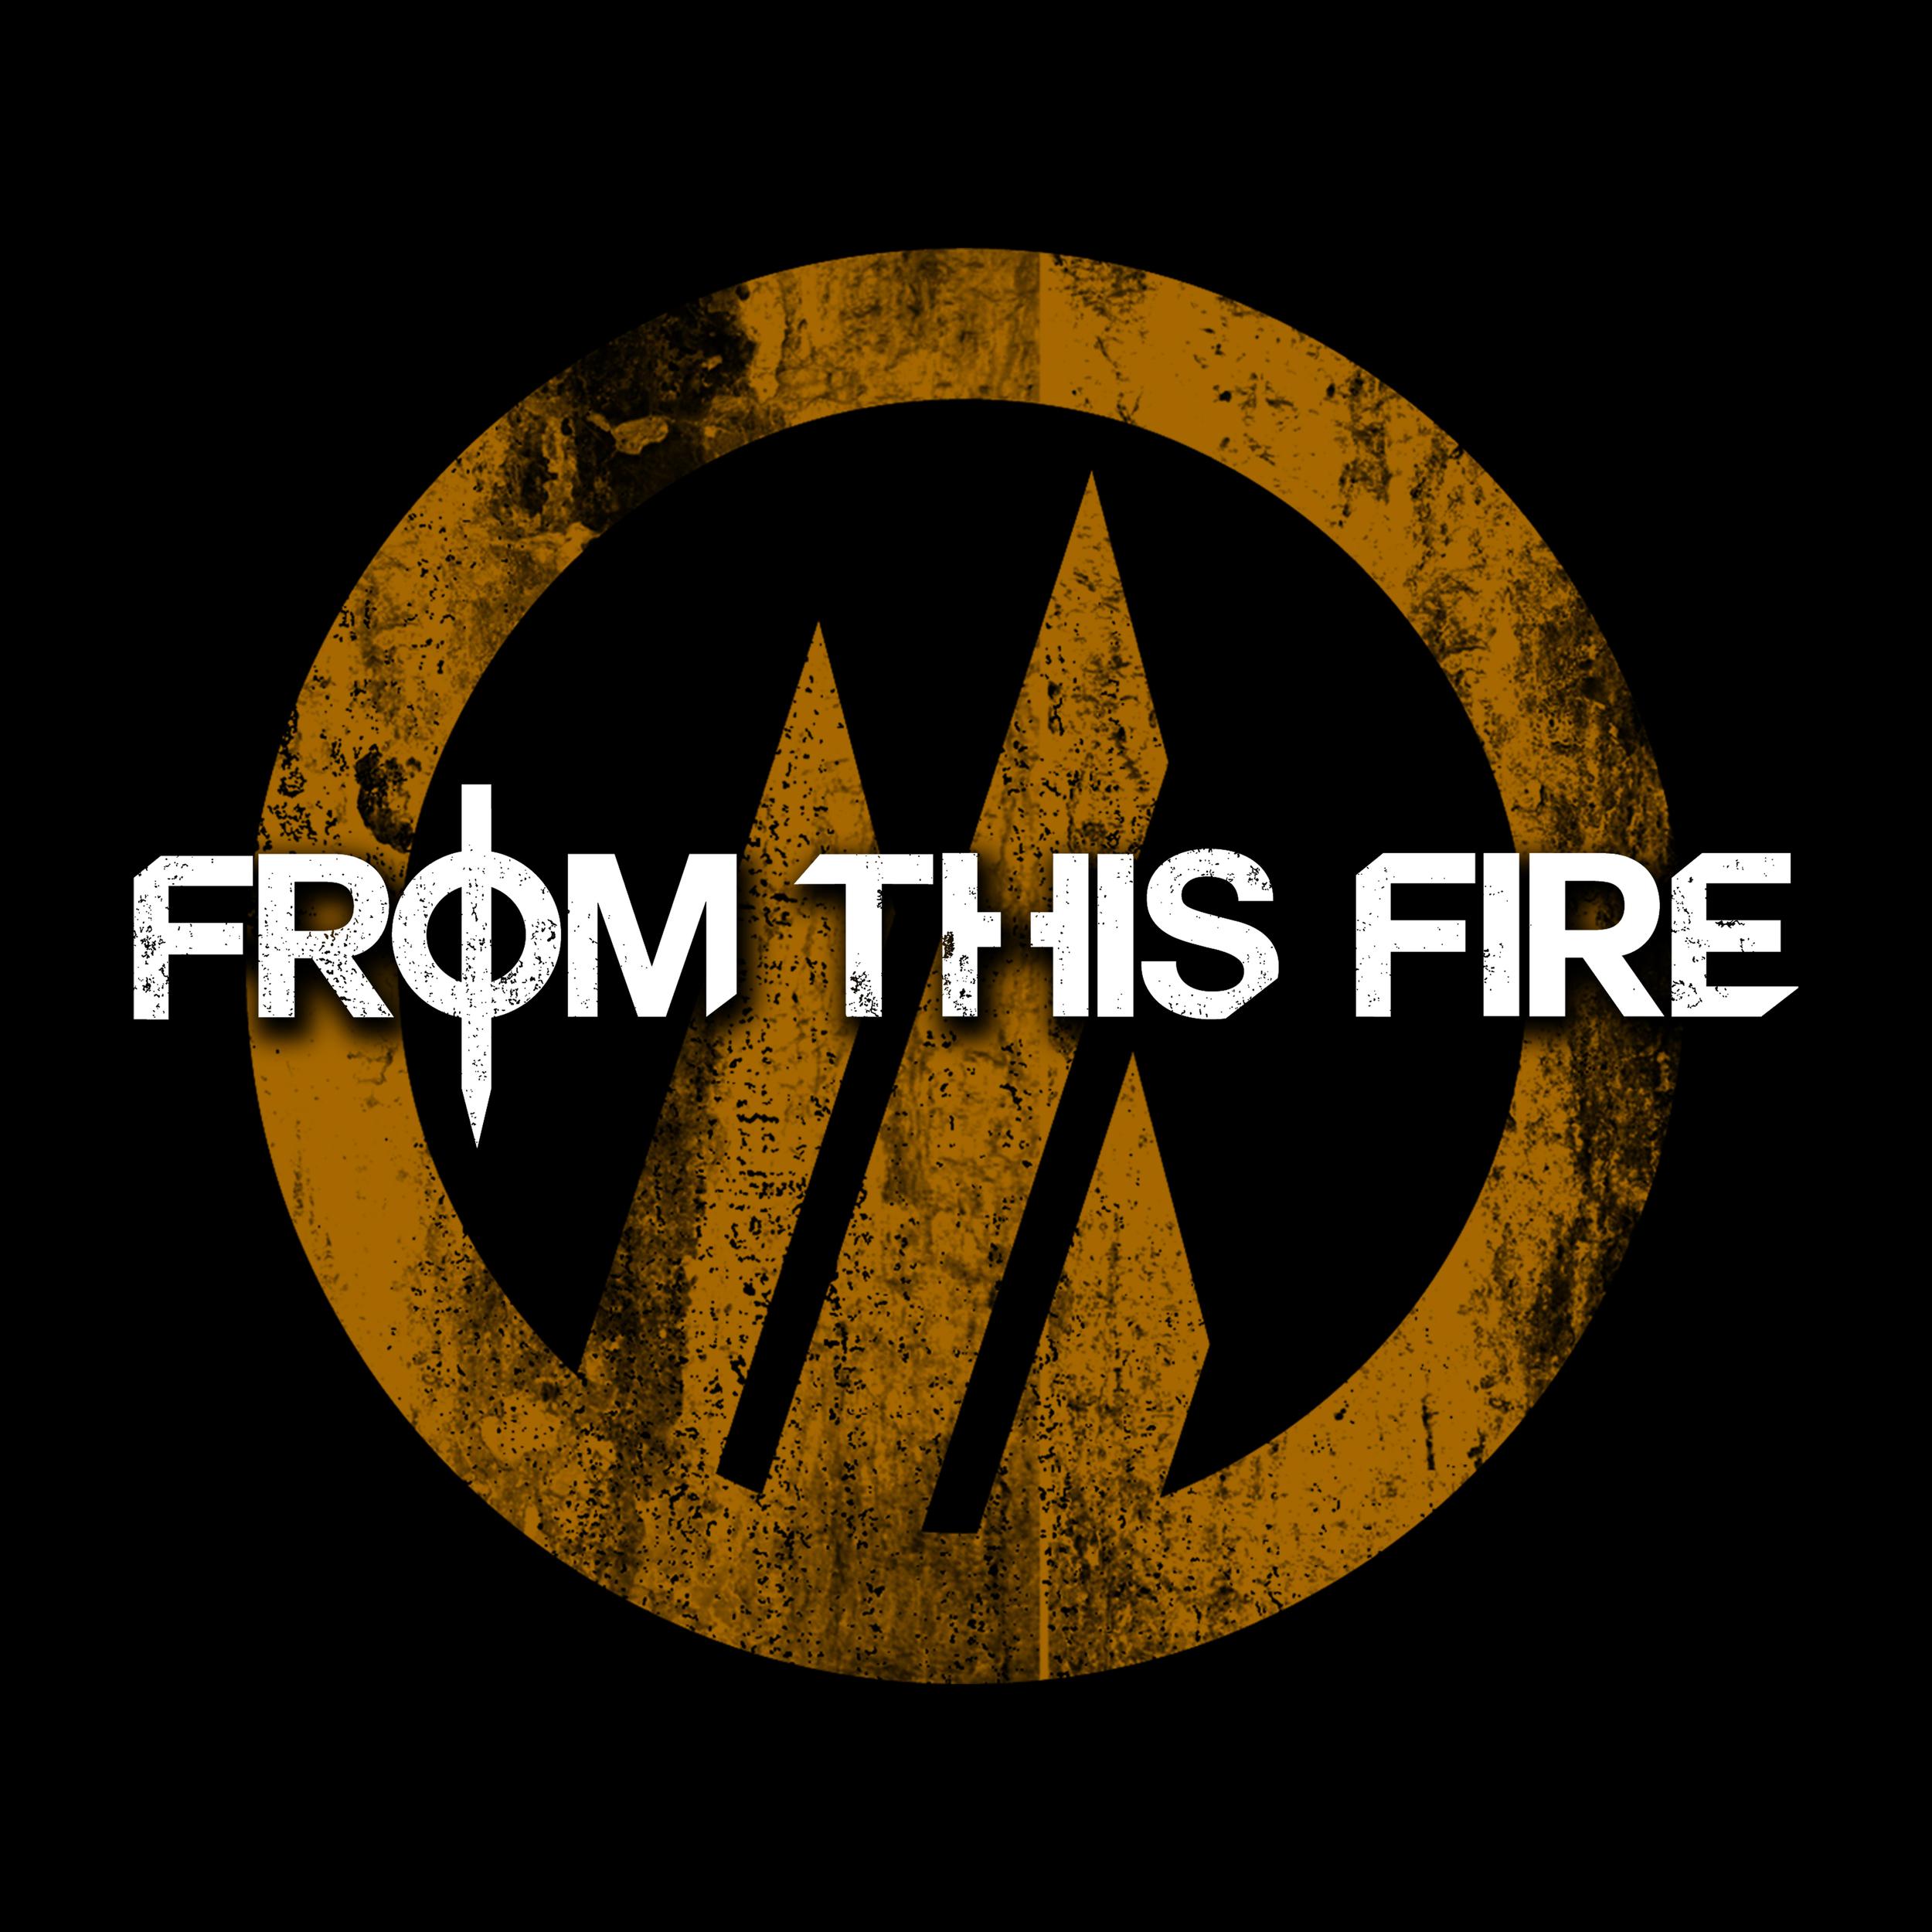 FTF-Logo-Fire-NEW-WEB-150x150.jpg